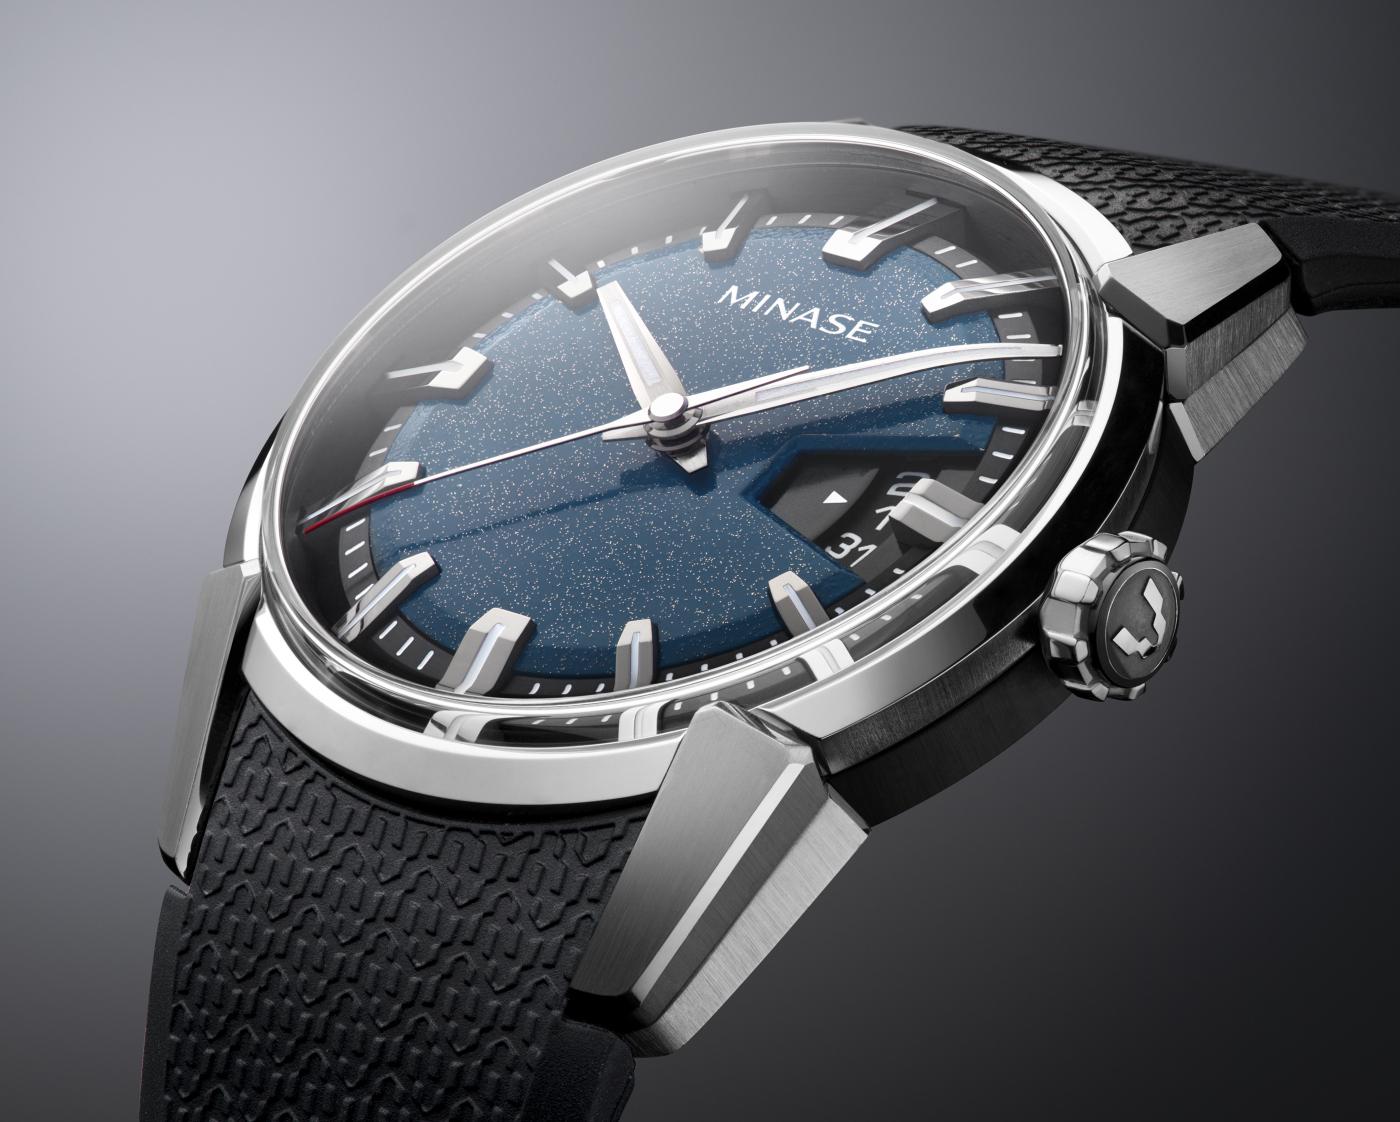 A new deep blue Urushi dial for Minase's Divido